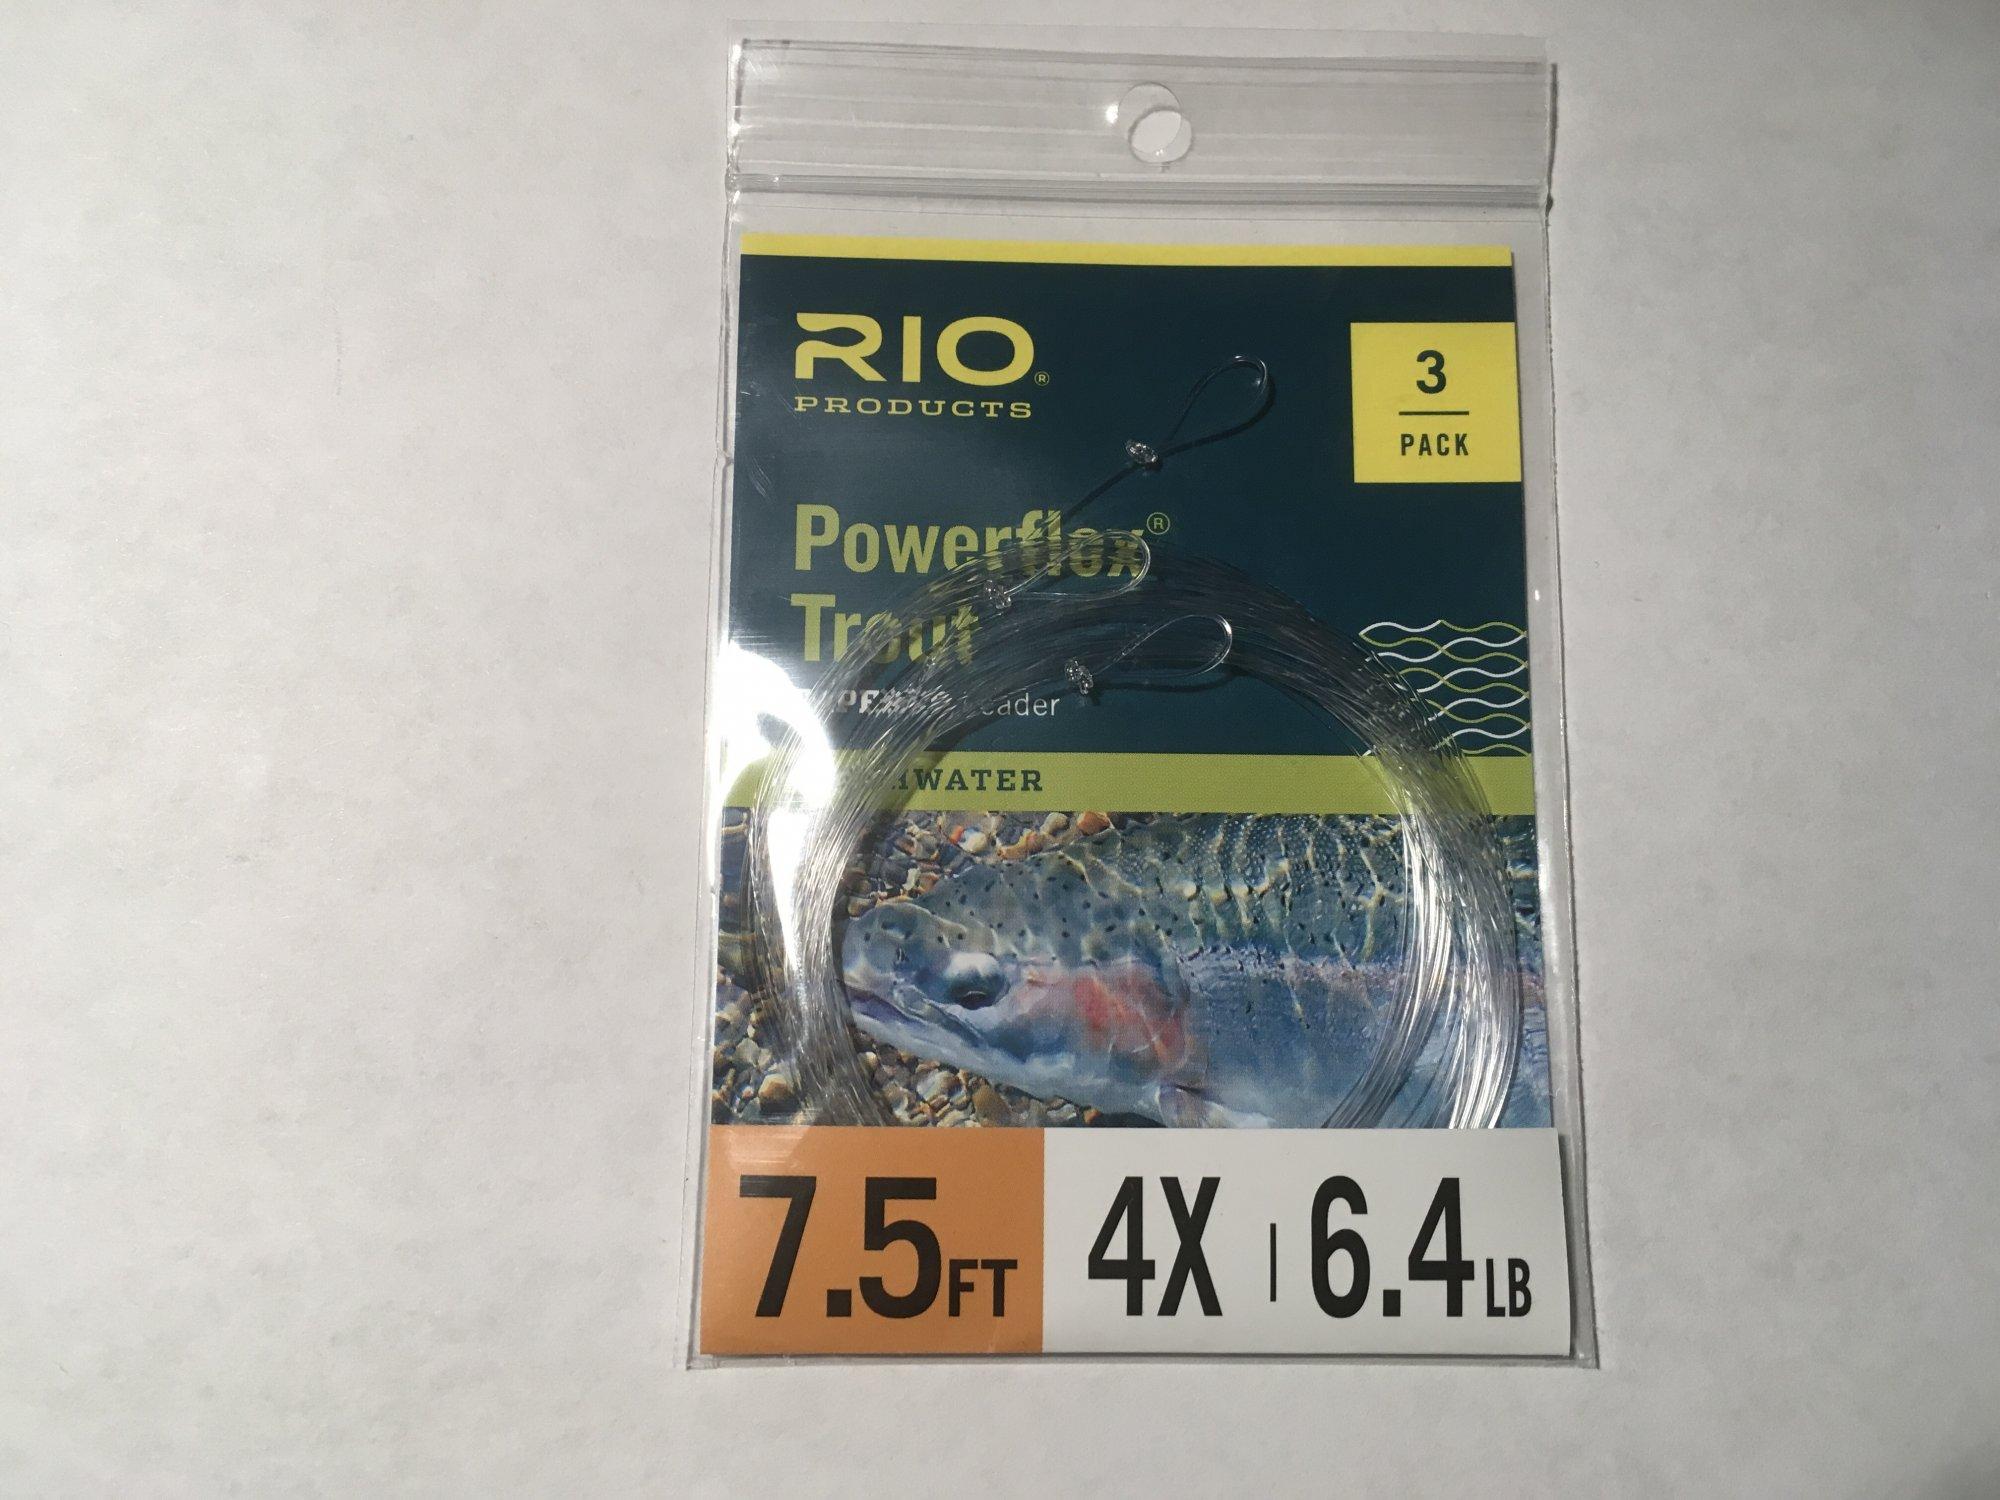 7.5 ft 4x leader 3 pack Powerflex